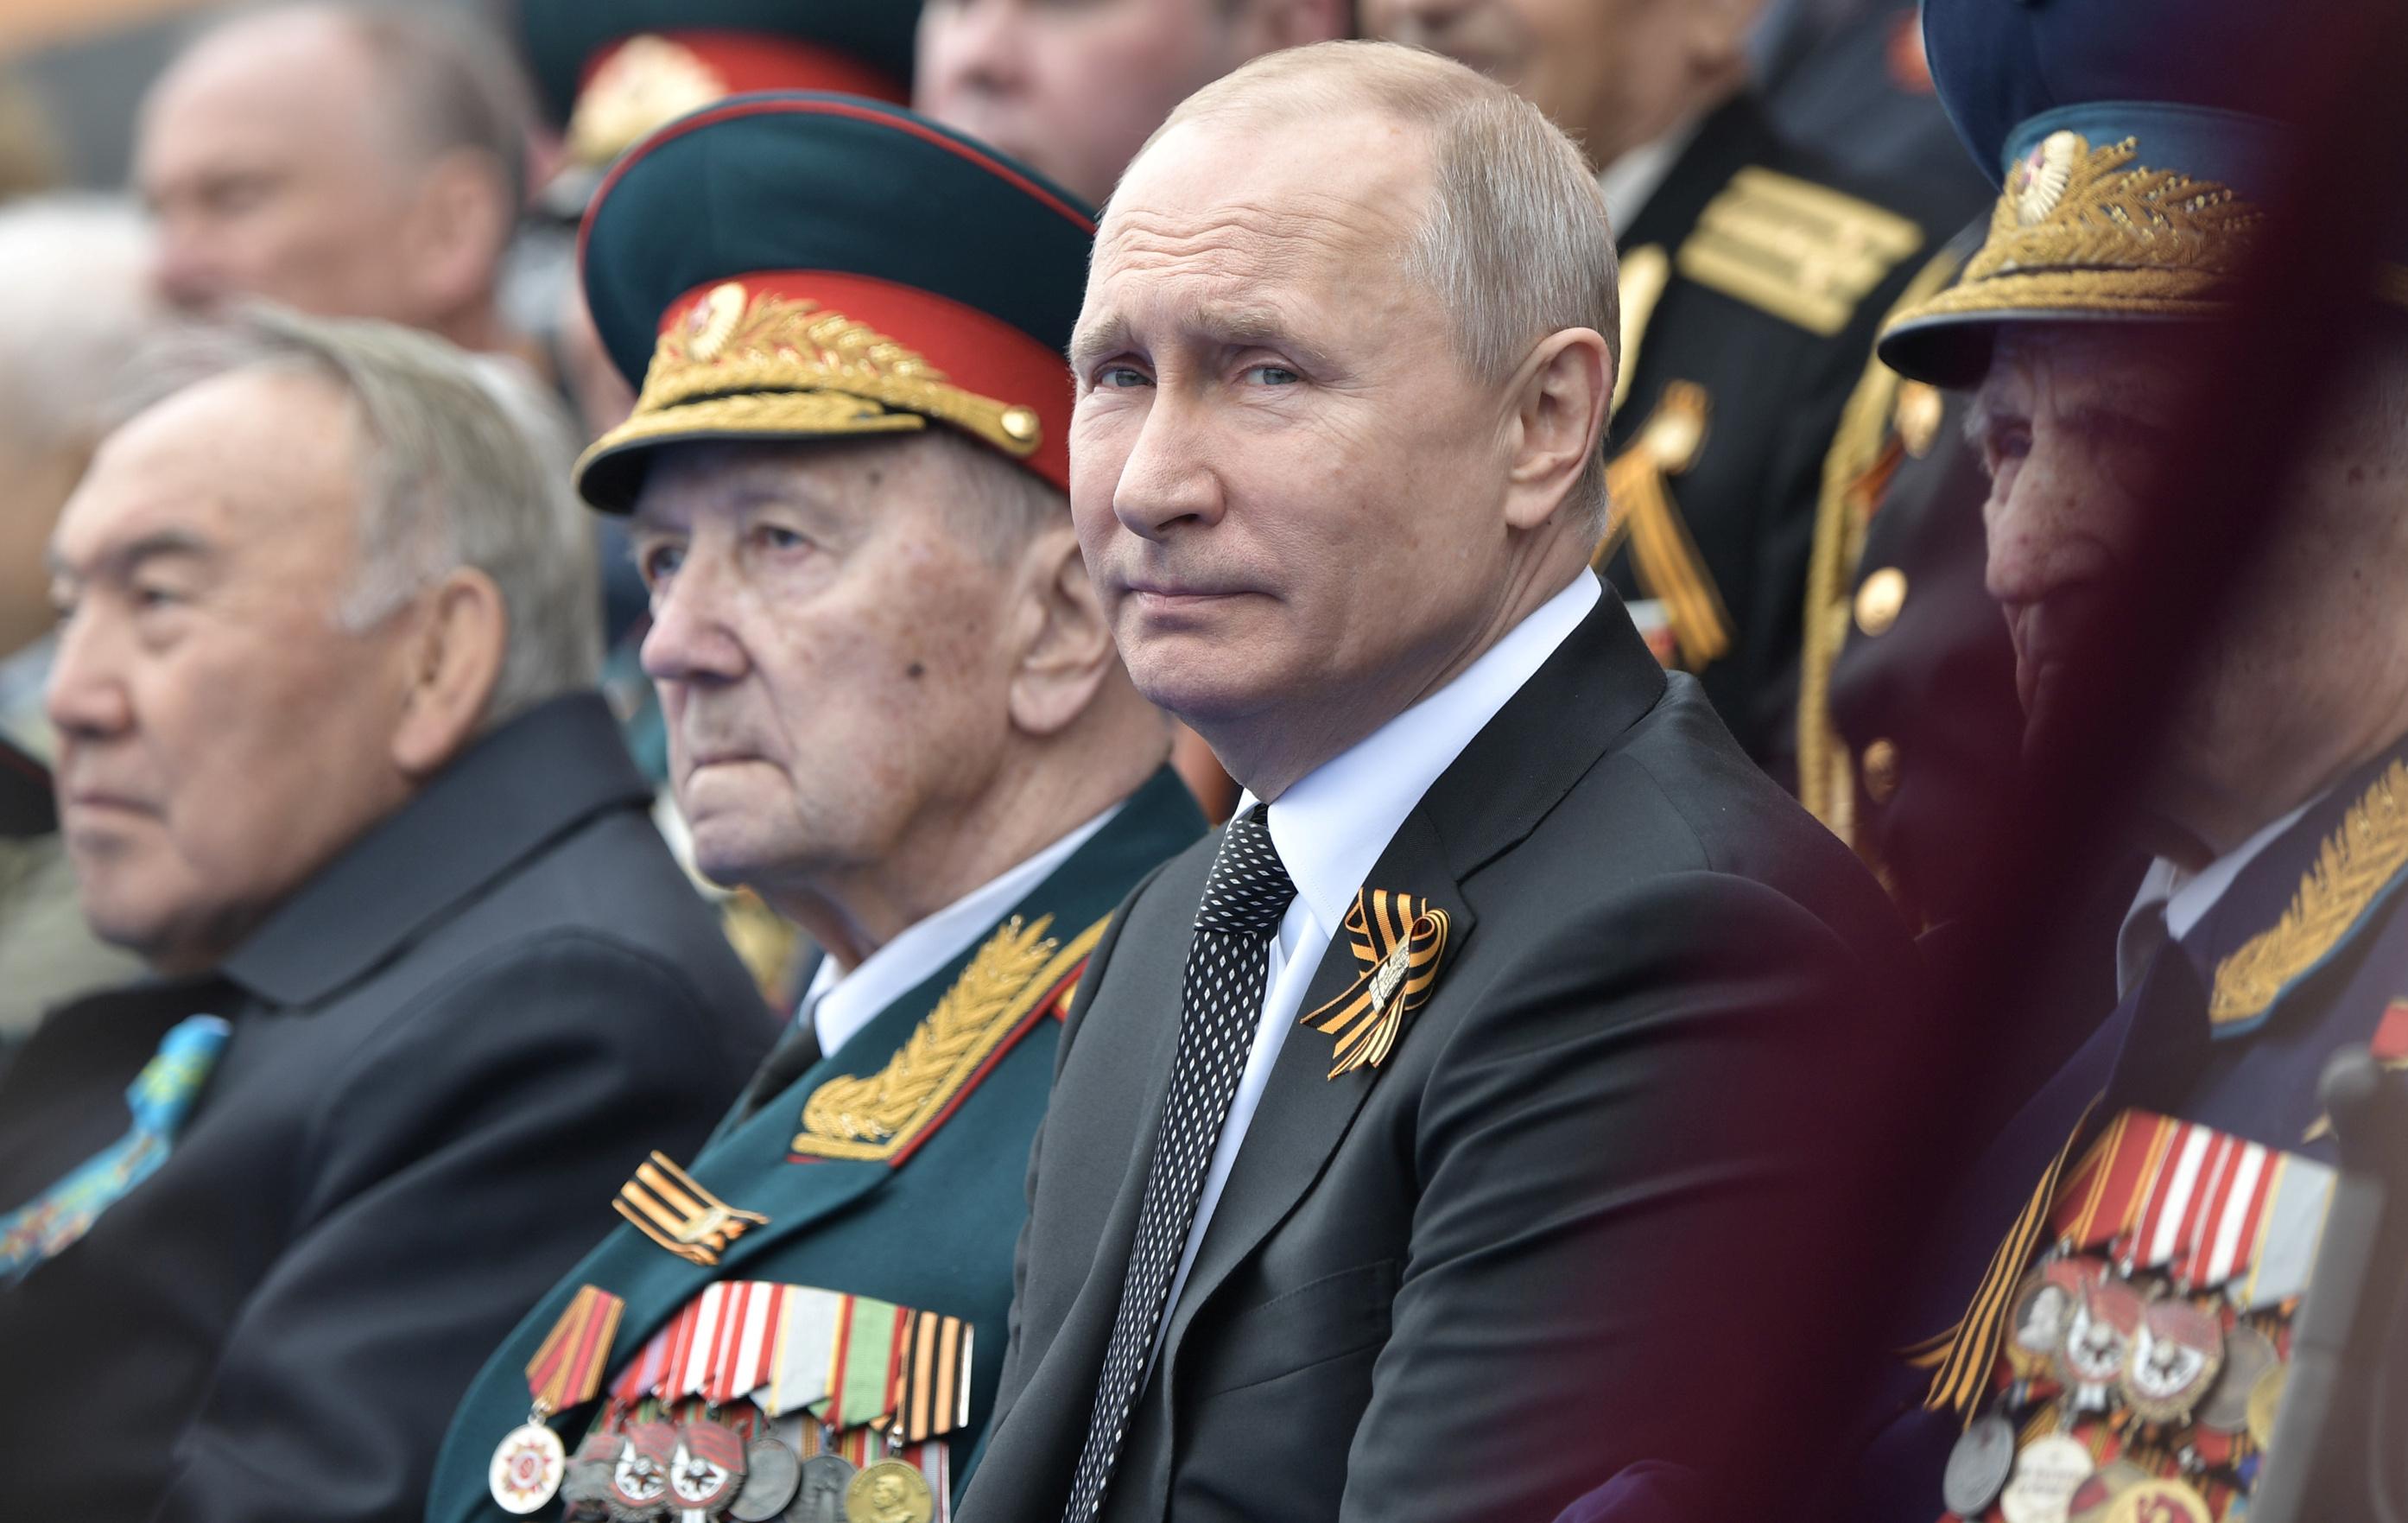 2019-05-09T084454Z_469523144_RC148722B150_RTRMADP_3_WW2-ANNIVERSARY-RUSSIA-PARADE